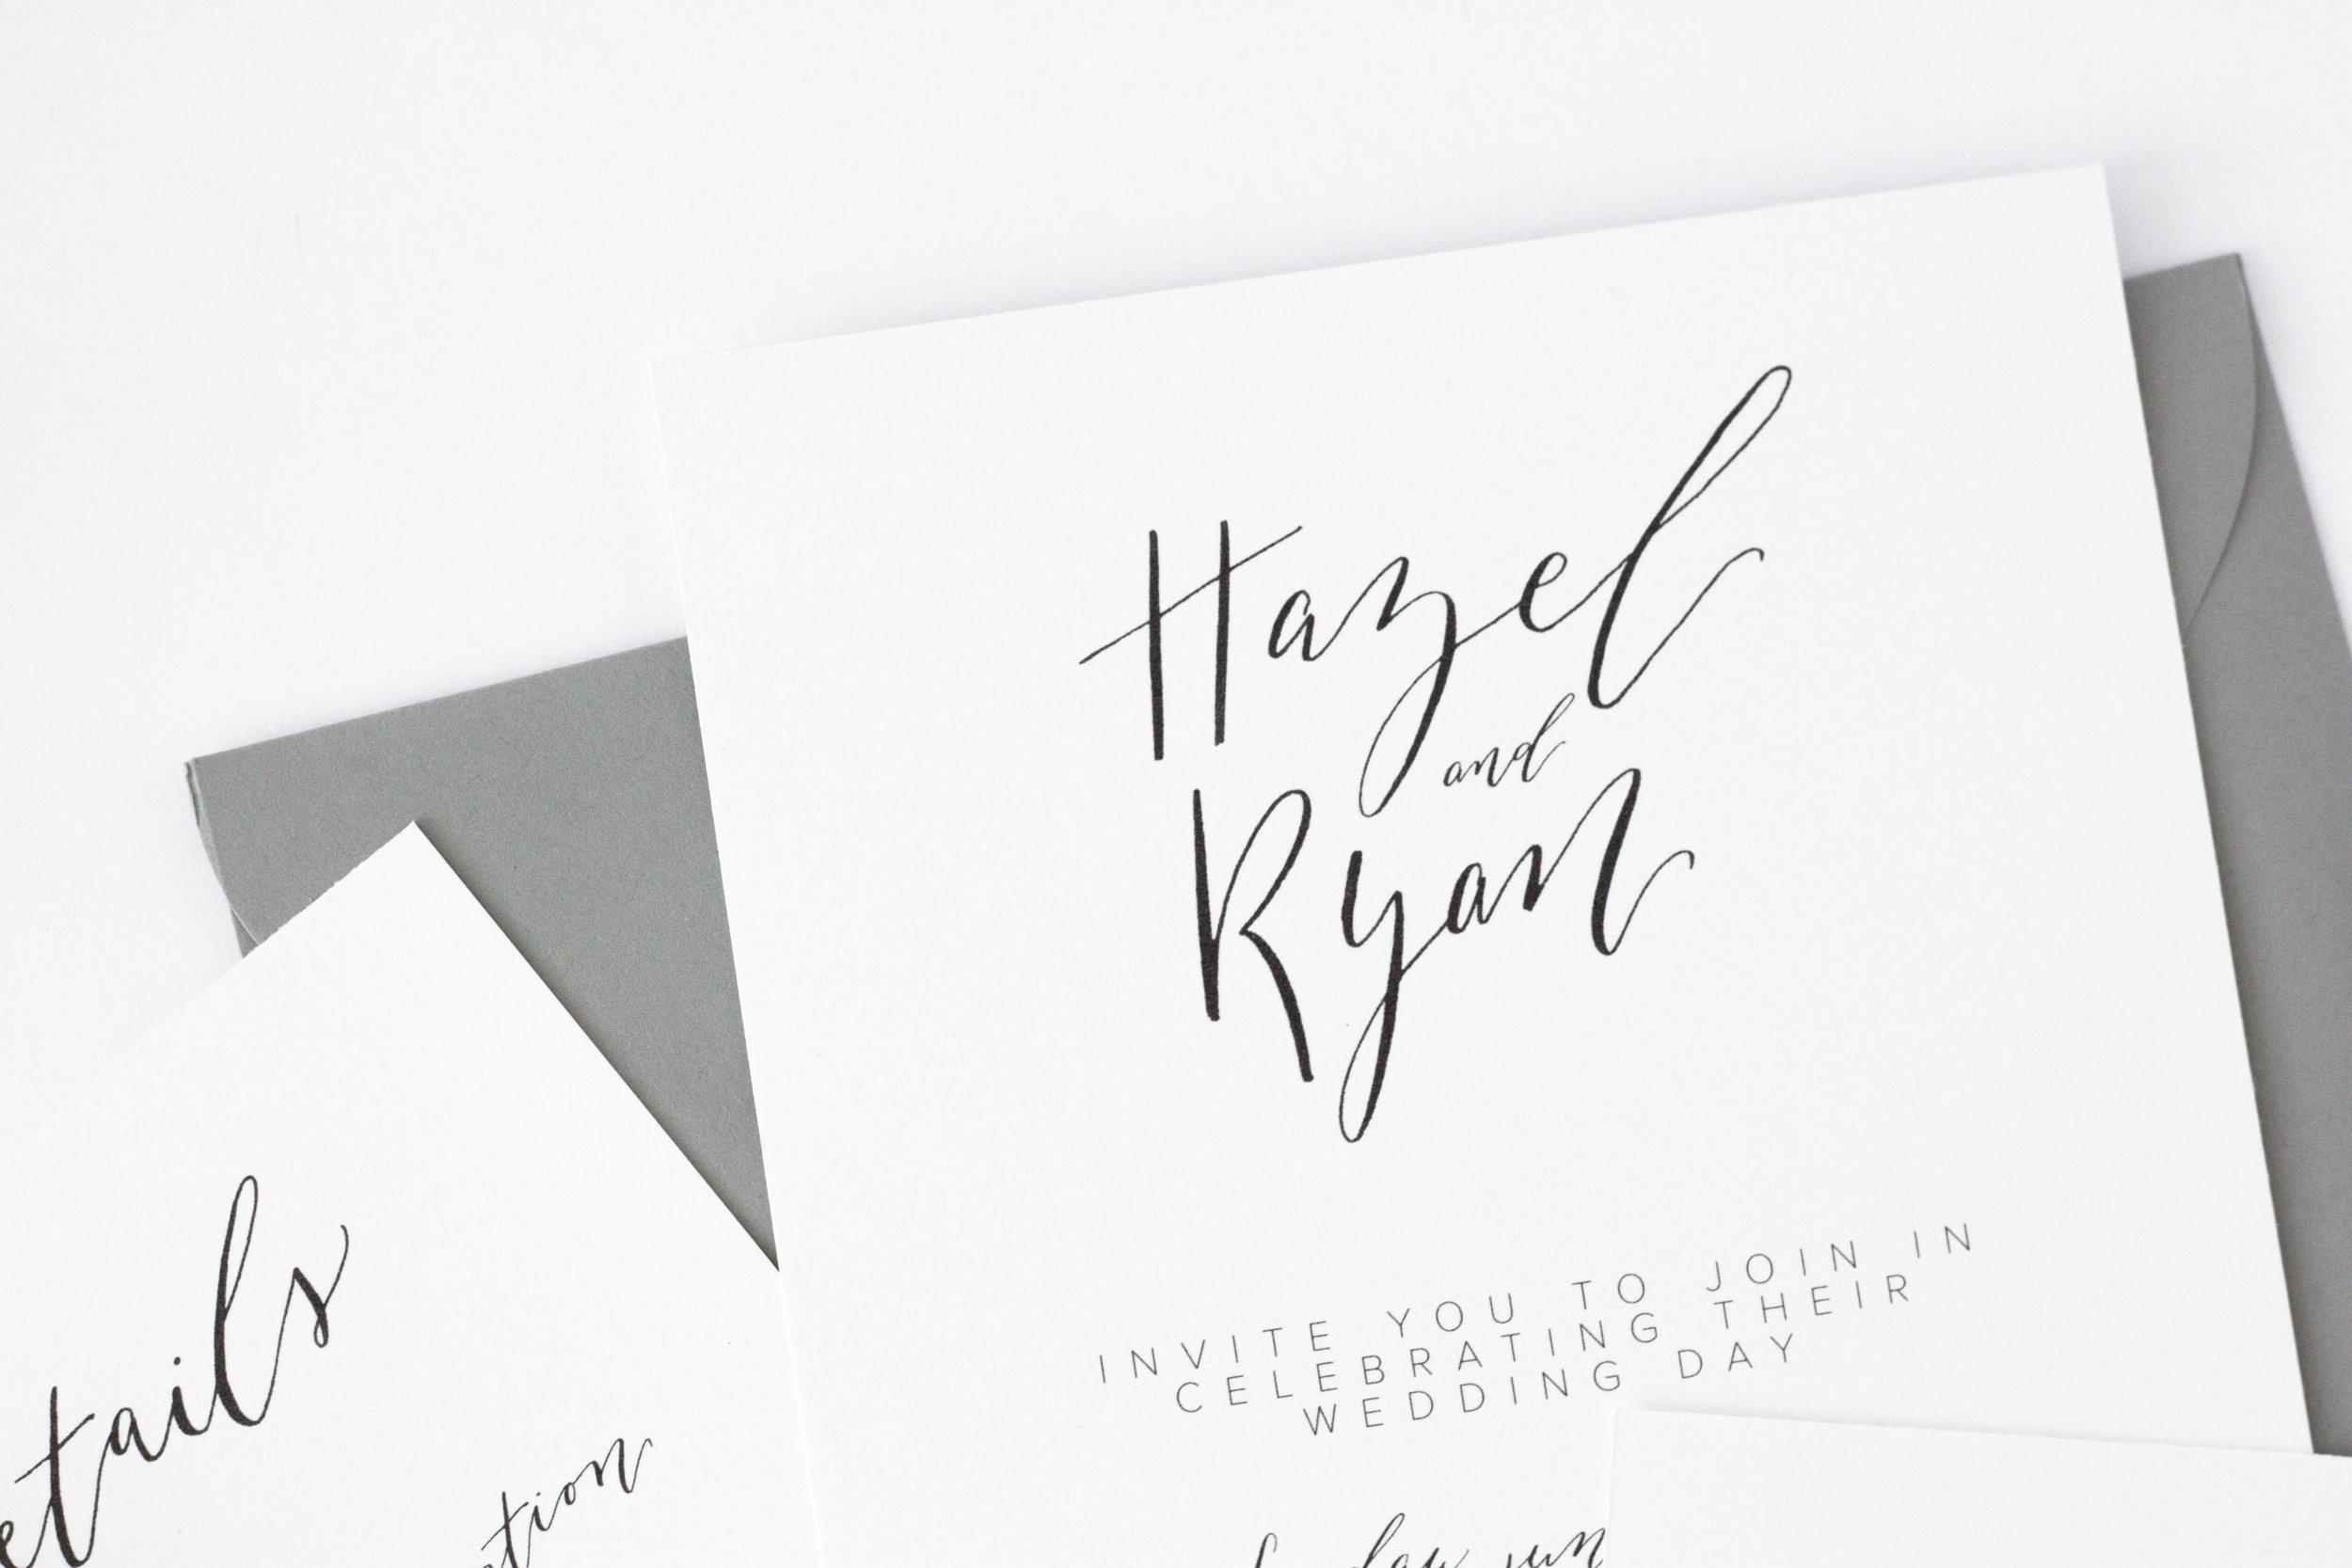 Black and White Invitations-Minimalist Wedding Invitation - Modern Calligraphy-TrueNorthPaperCo